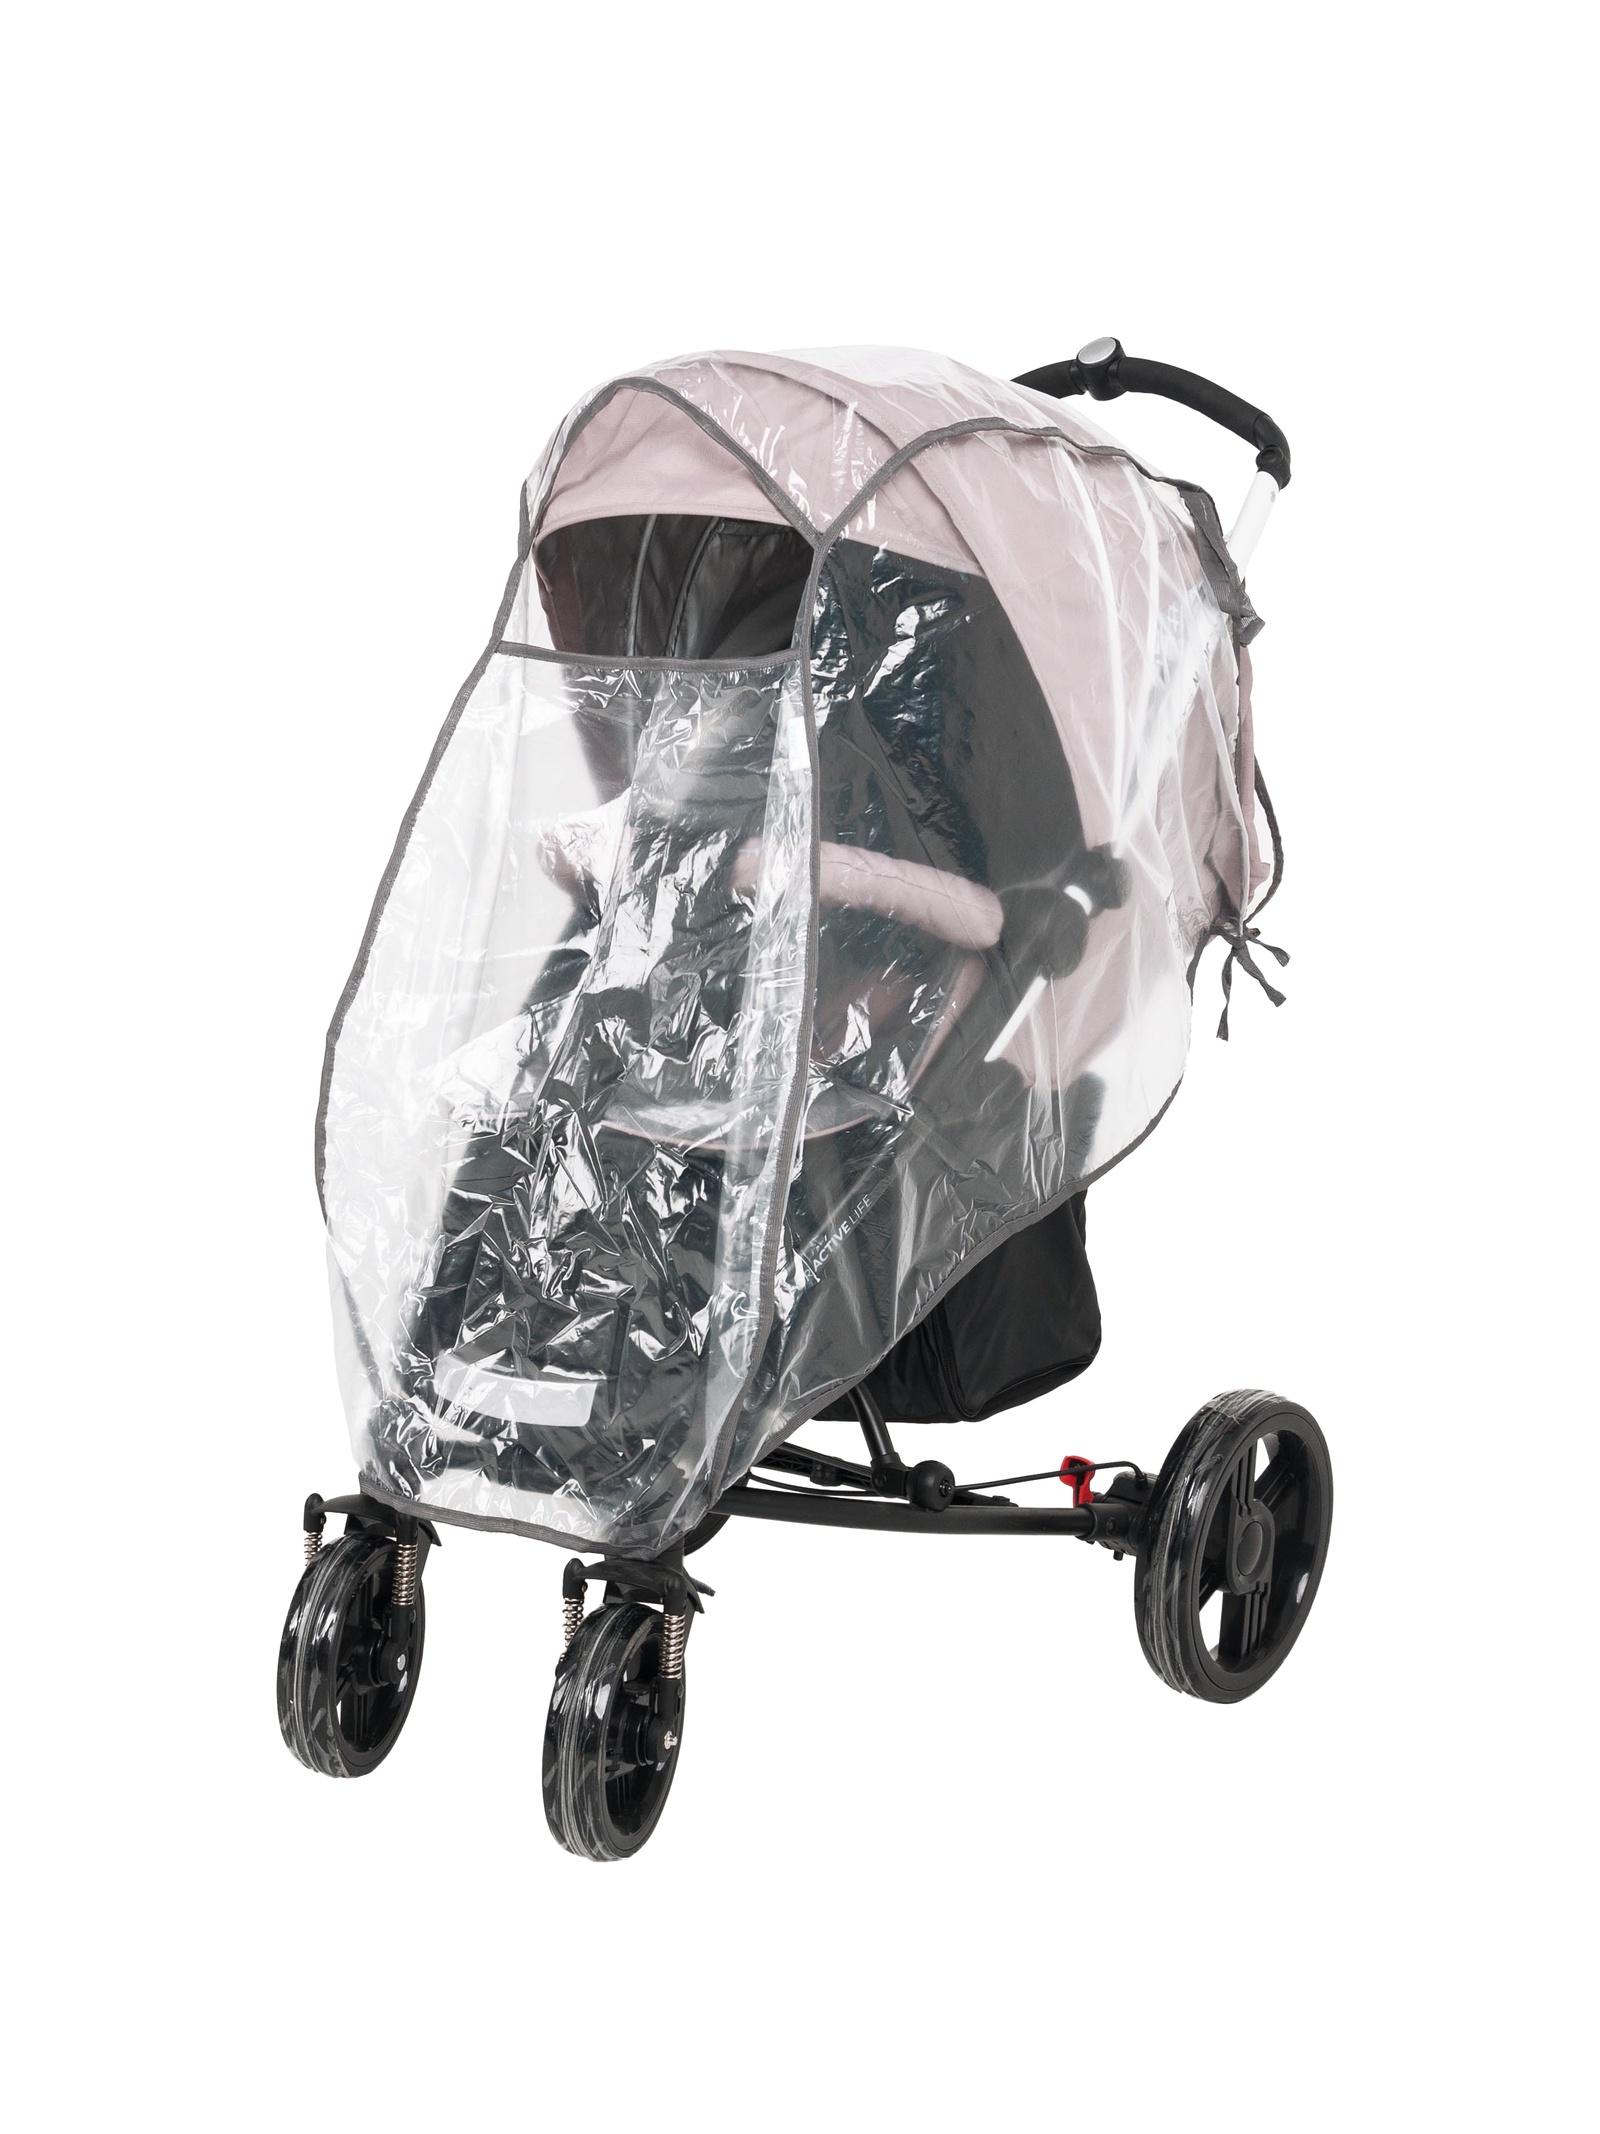 Аксессуар для колясок Trottola Дождевик на большую прогулочную коляску TRAVEL BIG прозрачный цена